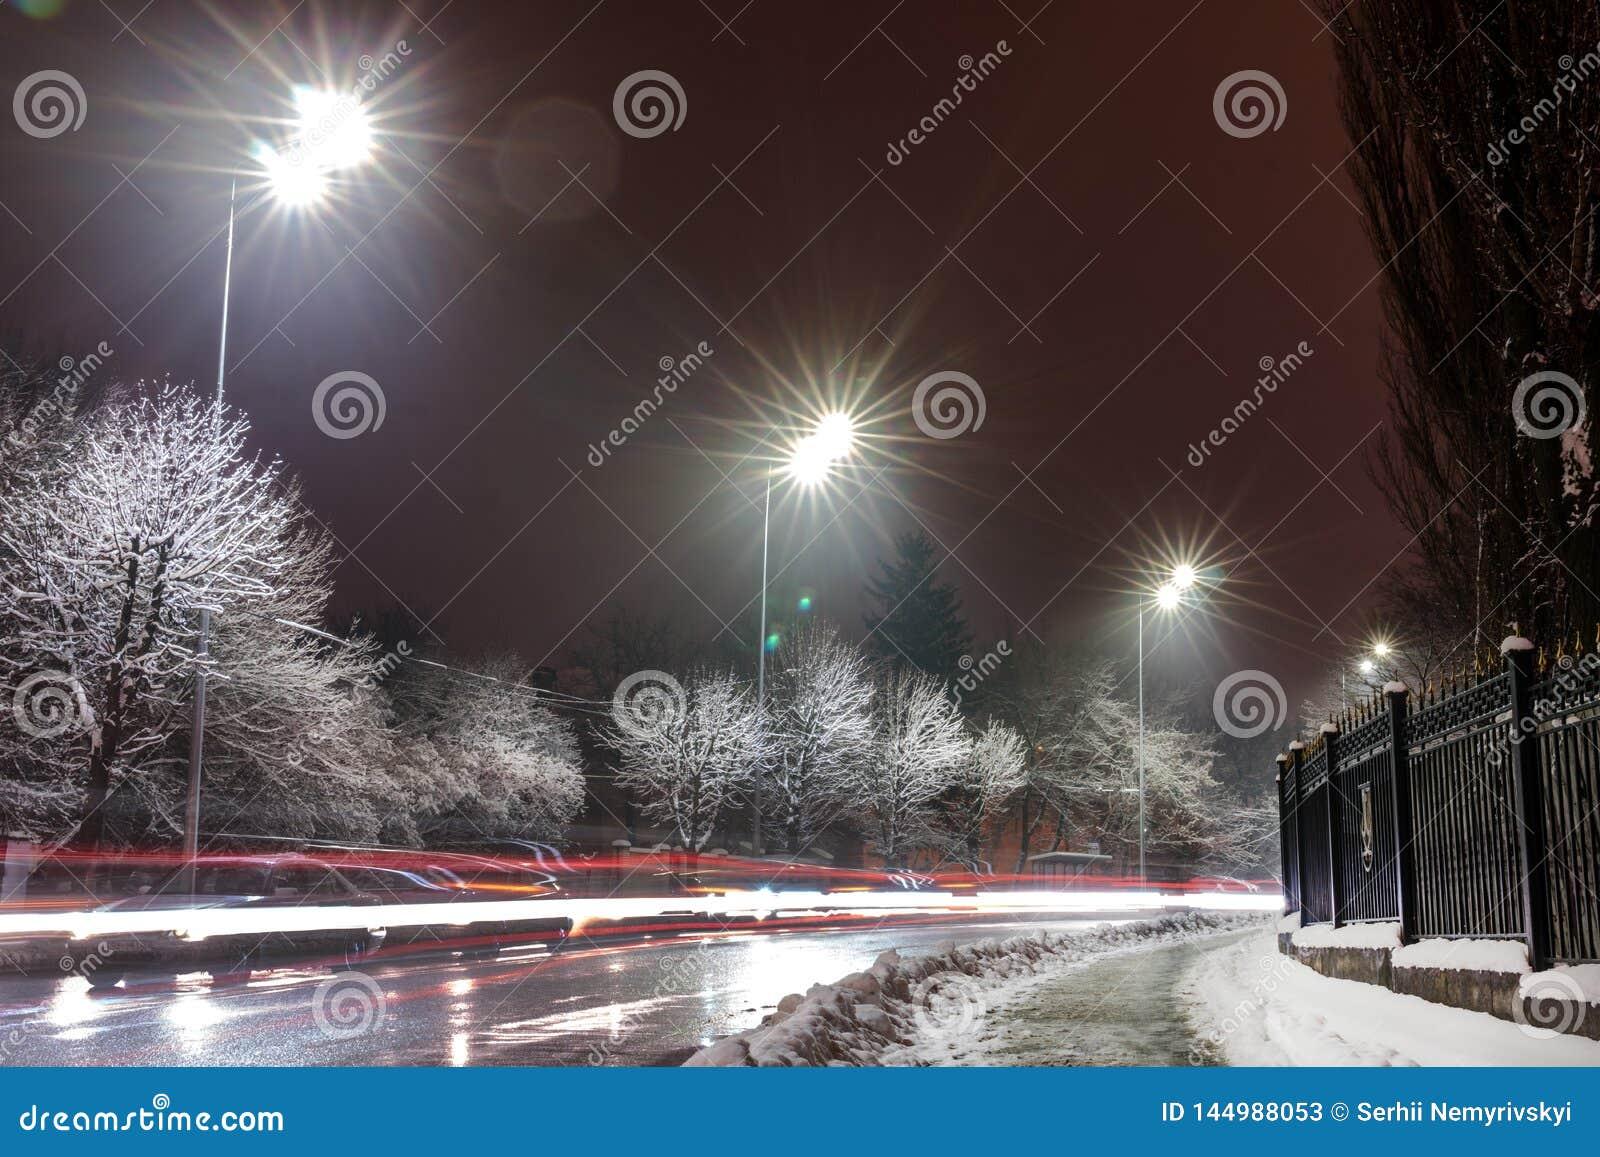 Tr?fego movente r?pido na noite Esta??o do inverno conceito da estrada, a remo??o de neve e de gelo, o perigo e a seguran?a do mo